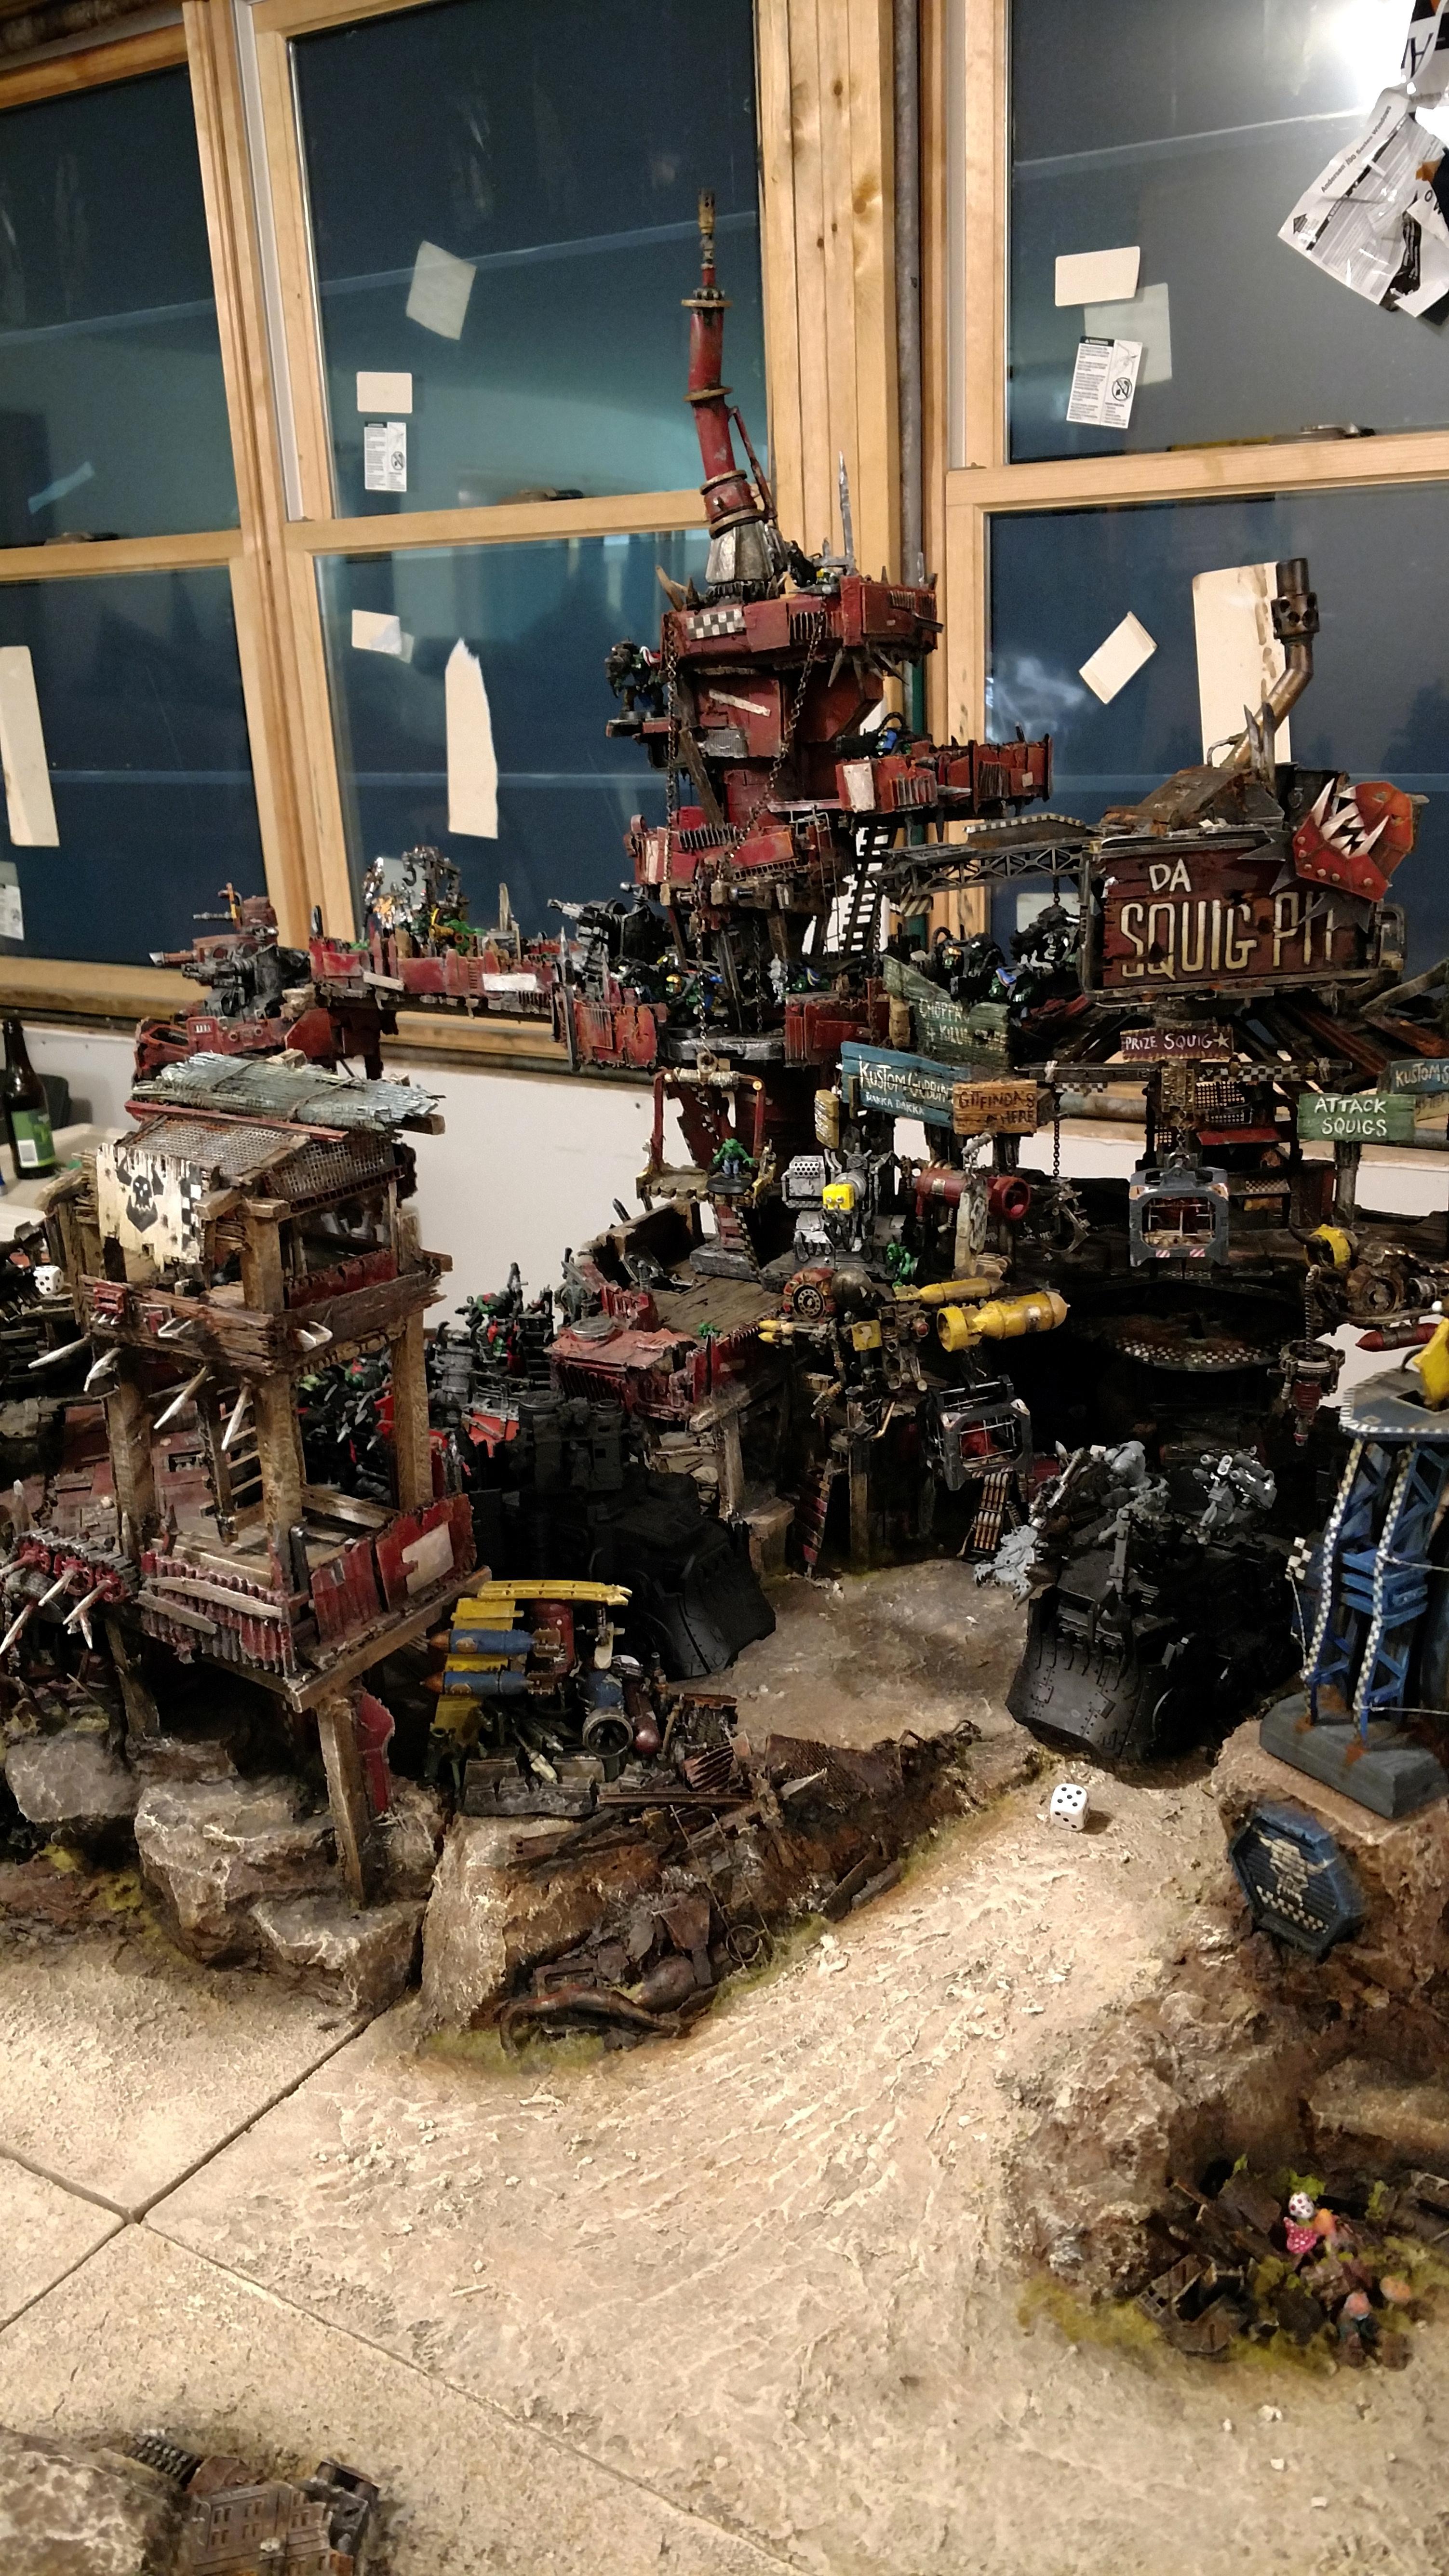 Ork Fort, Orks, Waaagh, Warhammer 40,000